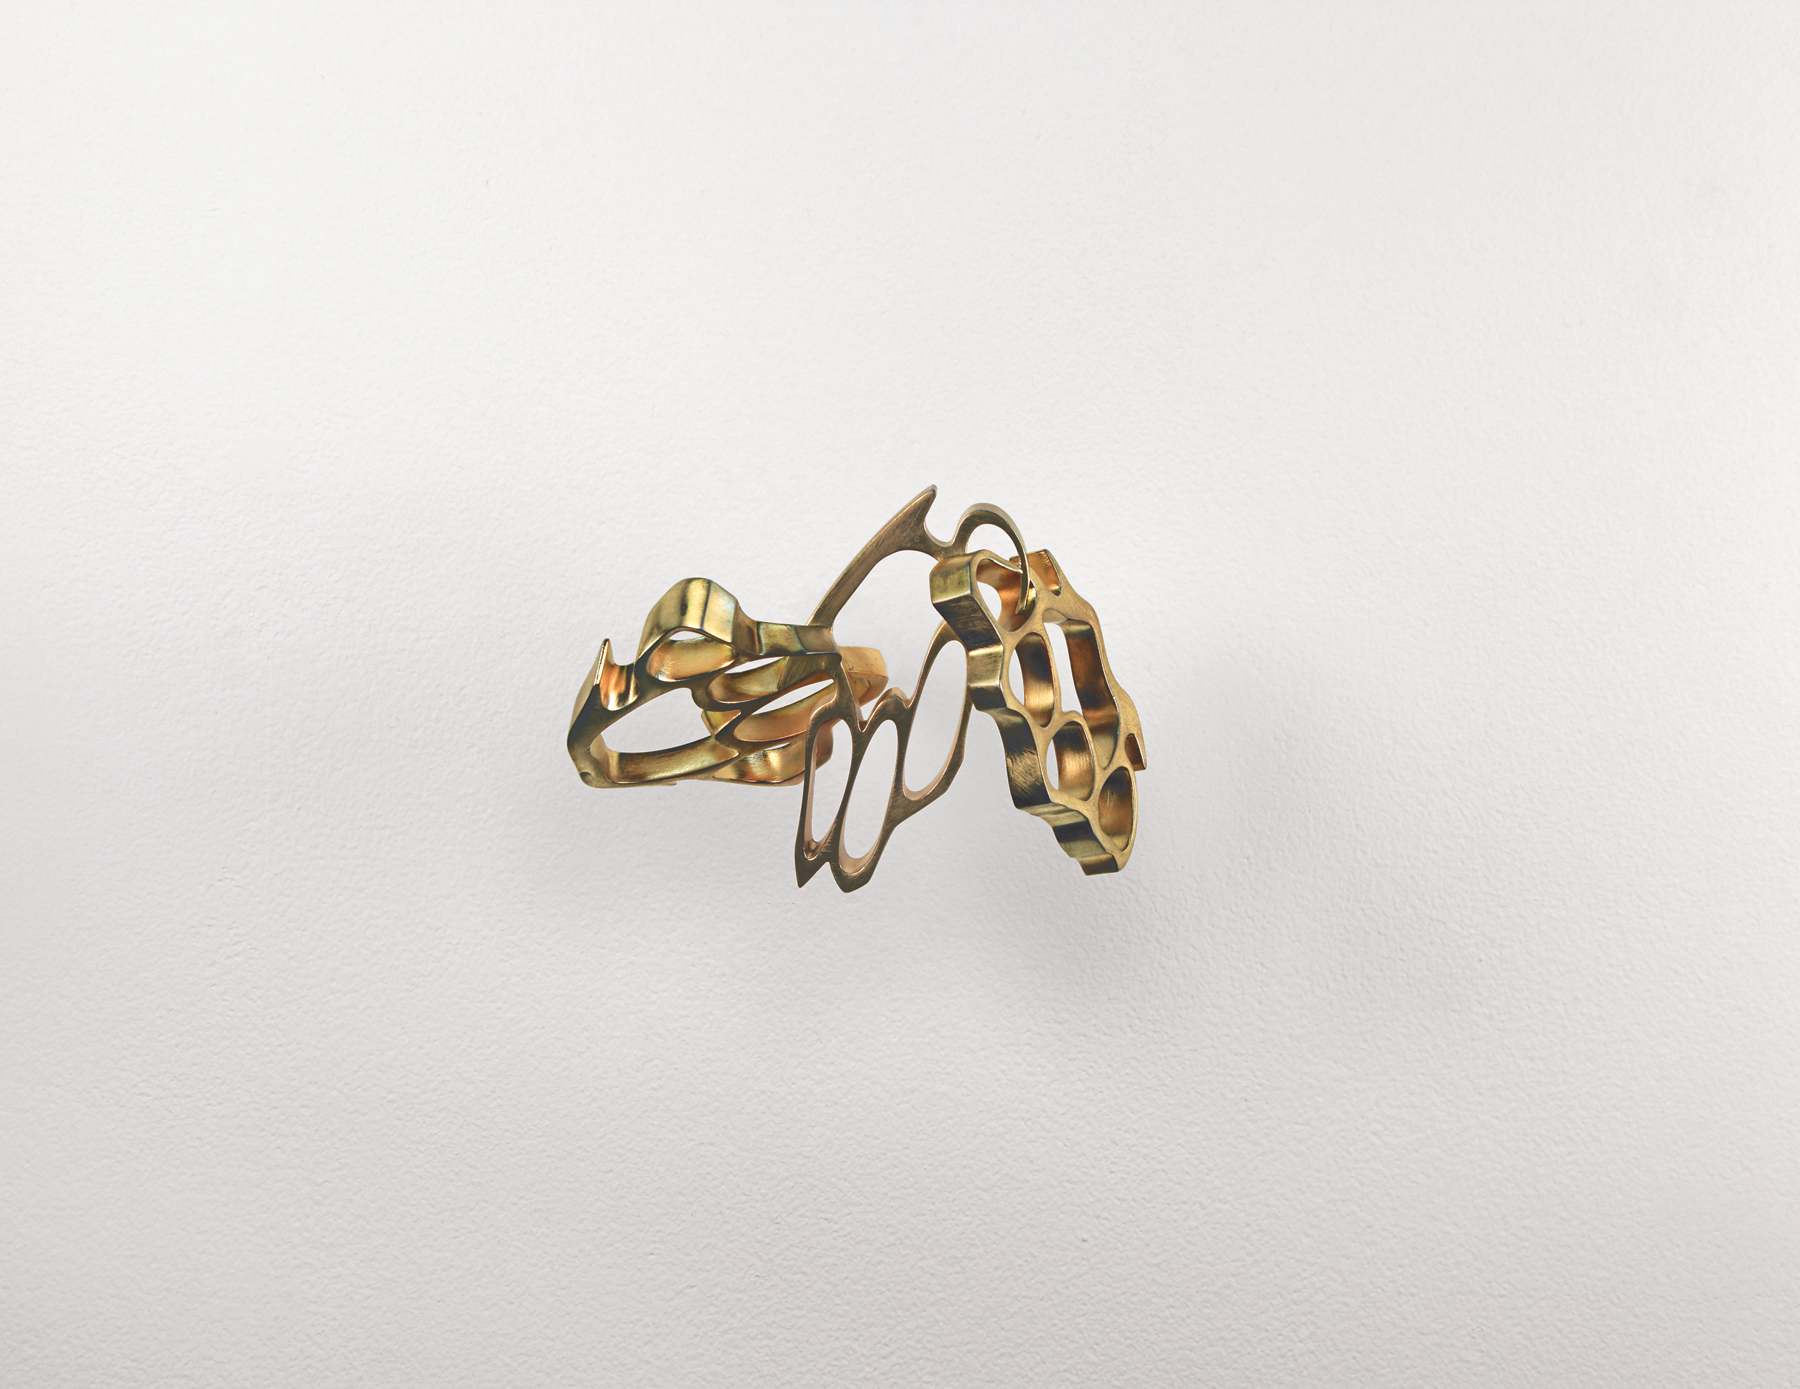 brass knuckles  (iv), 2010 brass, bronze 5 x 7 x 4 inches